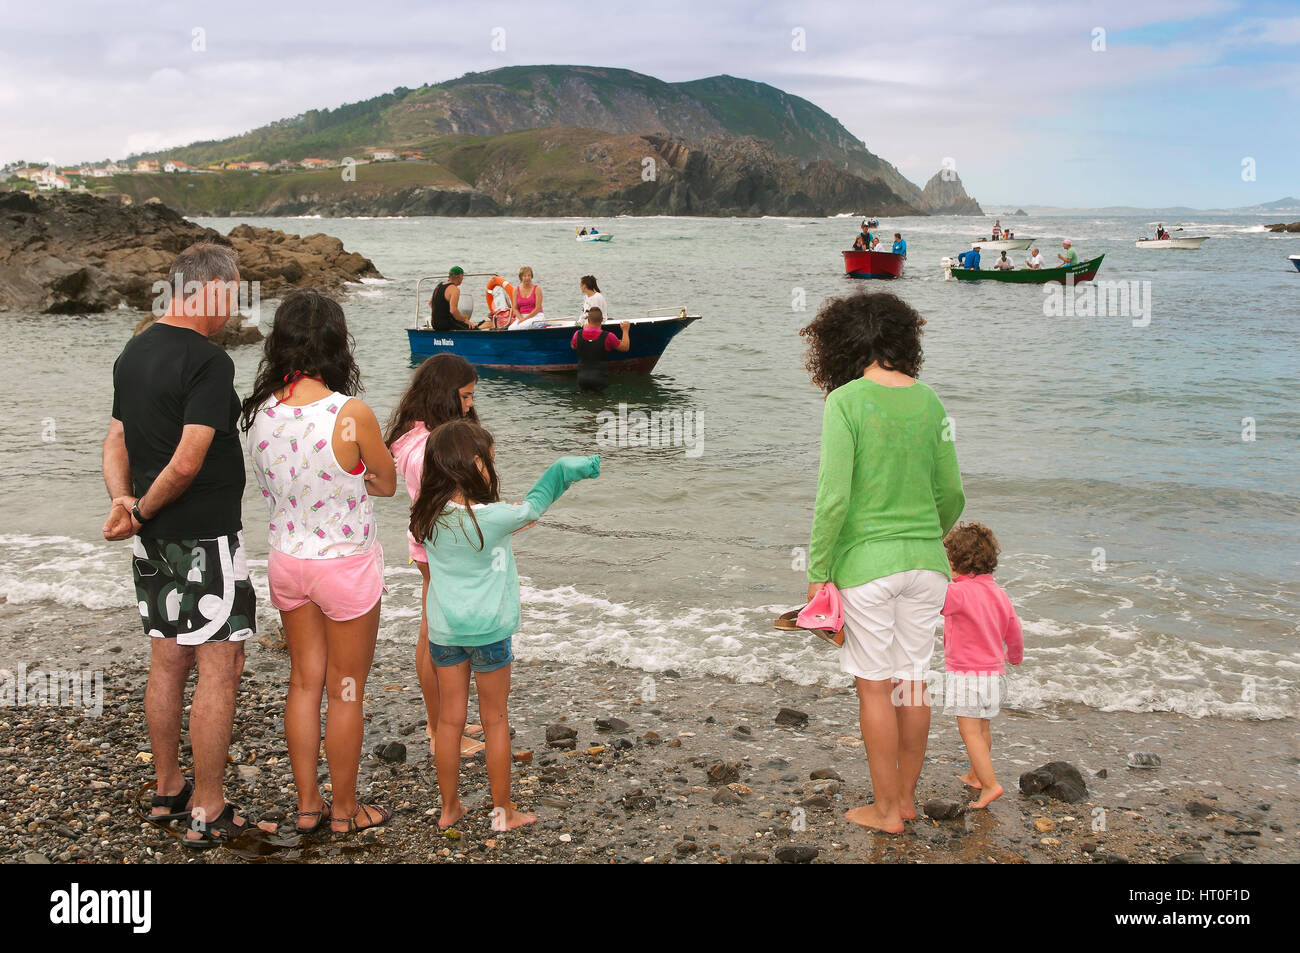 Festivity of the Virxe do Porto - people, Meiras - Valdoviño, La Coruña province, Region of Galicia, Spain, - Stock Image